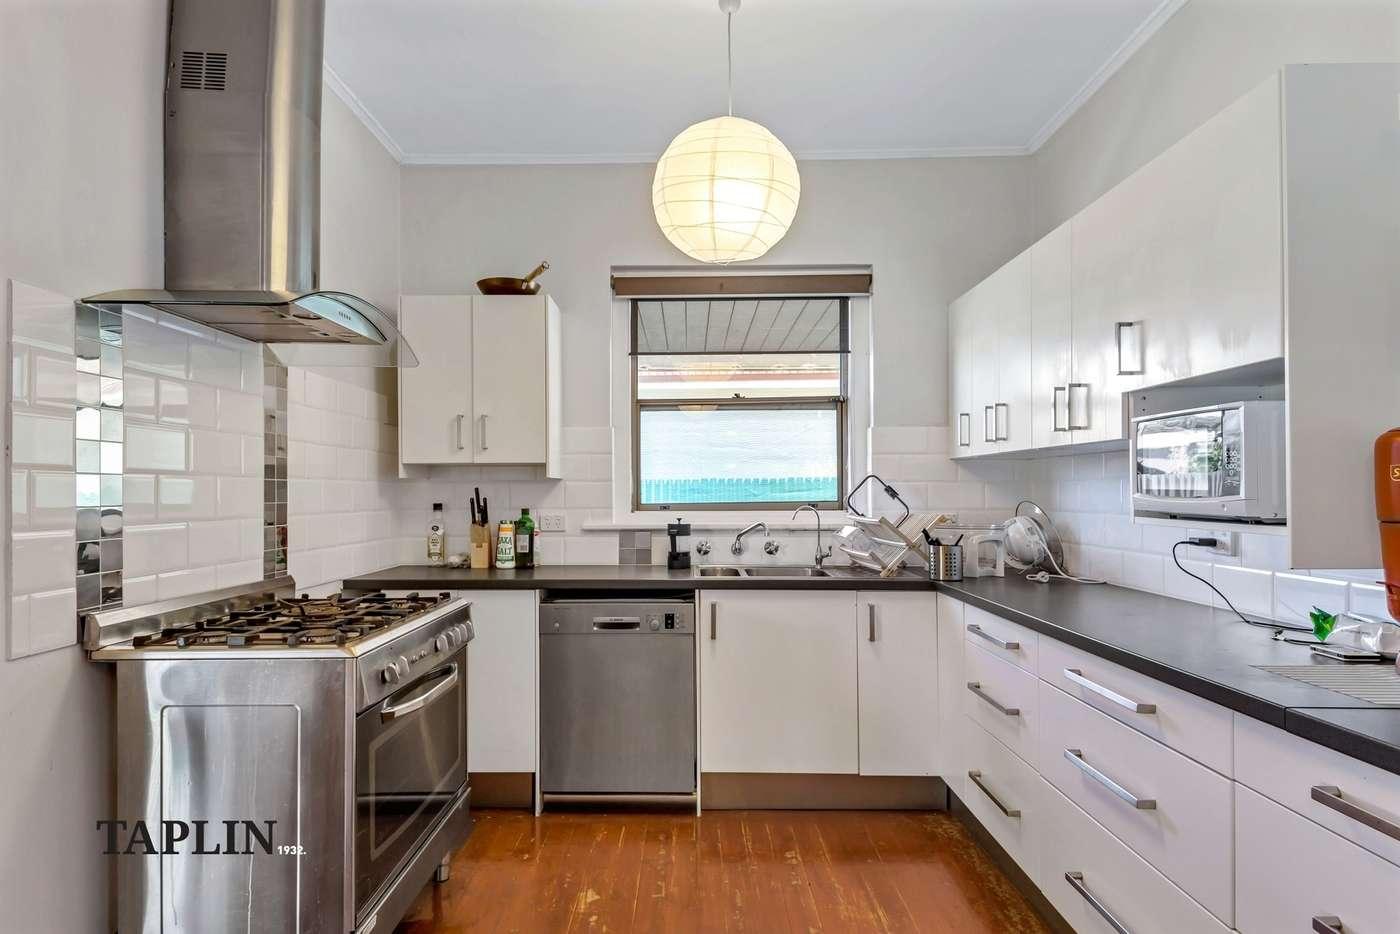 Main view of Homely house listing, 4 Rudford Street, Brighton SA 5048